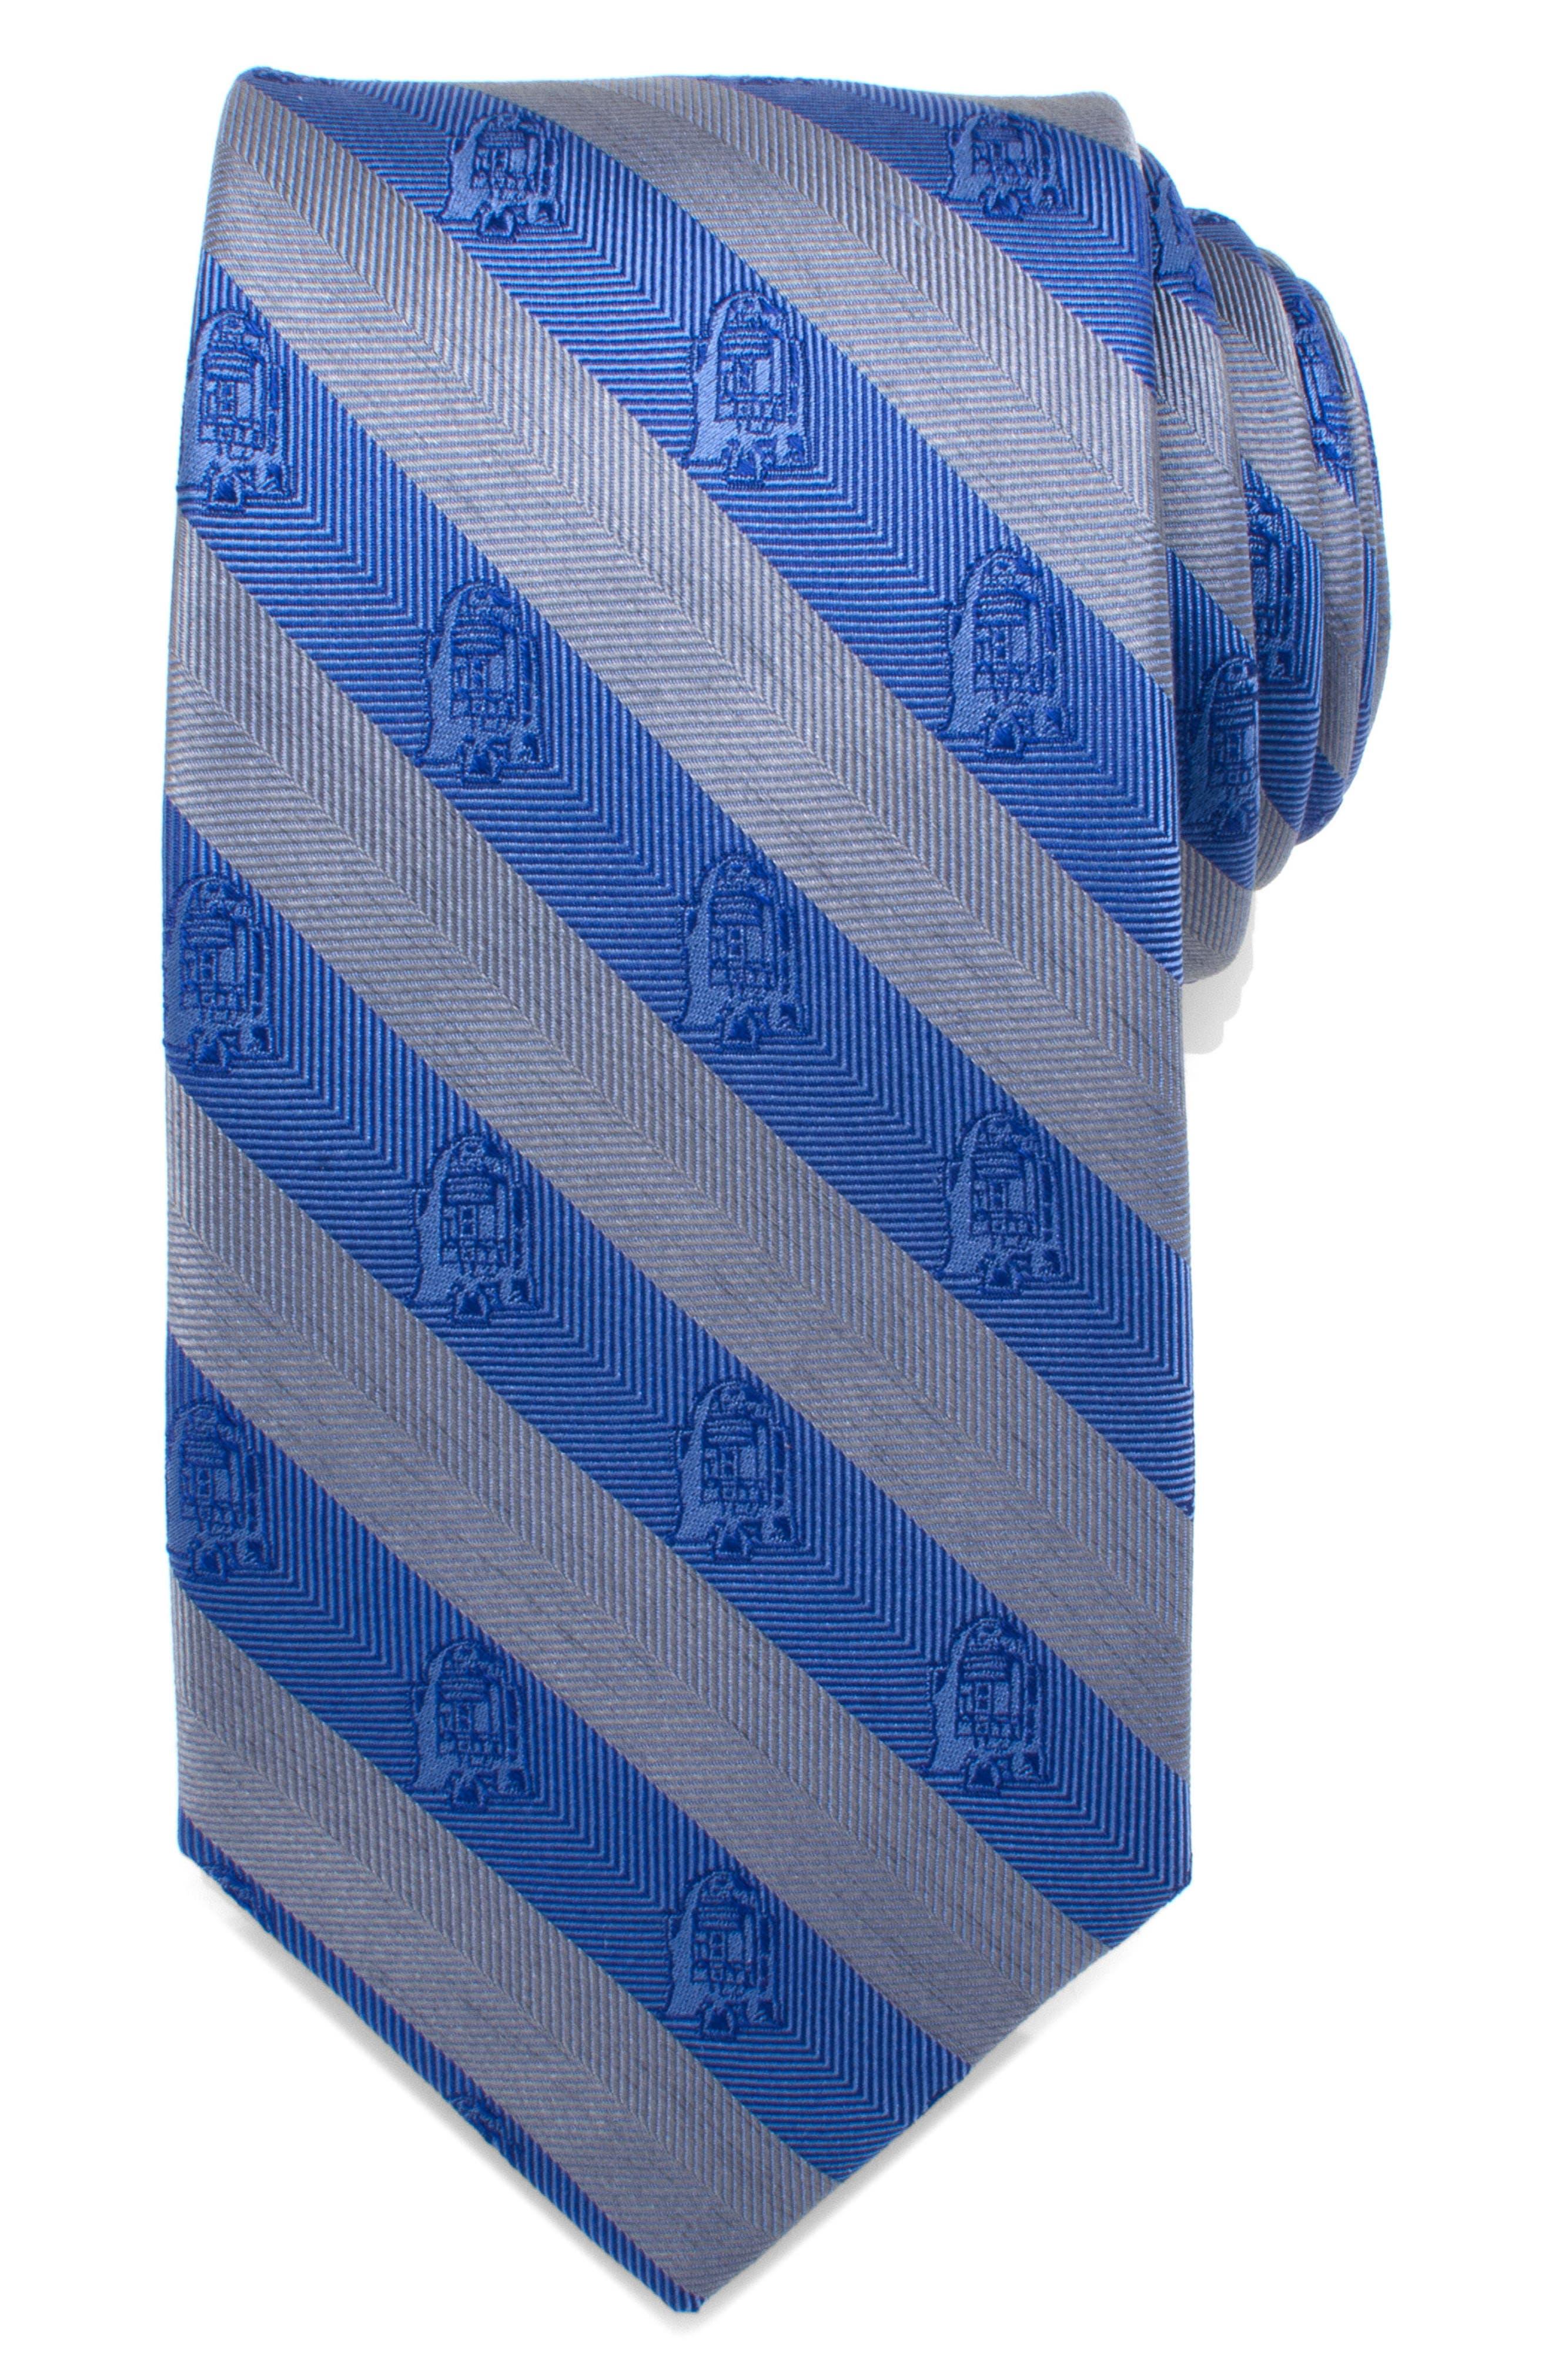 Star Wars<sup>™</sup> R2D2 Silk Tie,                             Main thumbnail 1, color,                             BLUE